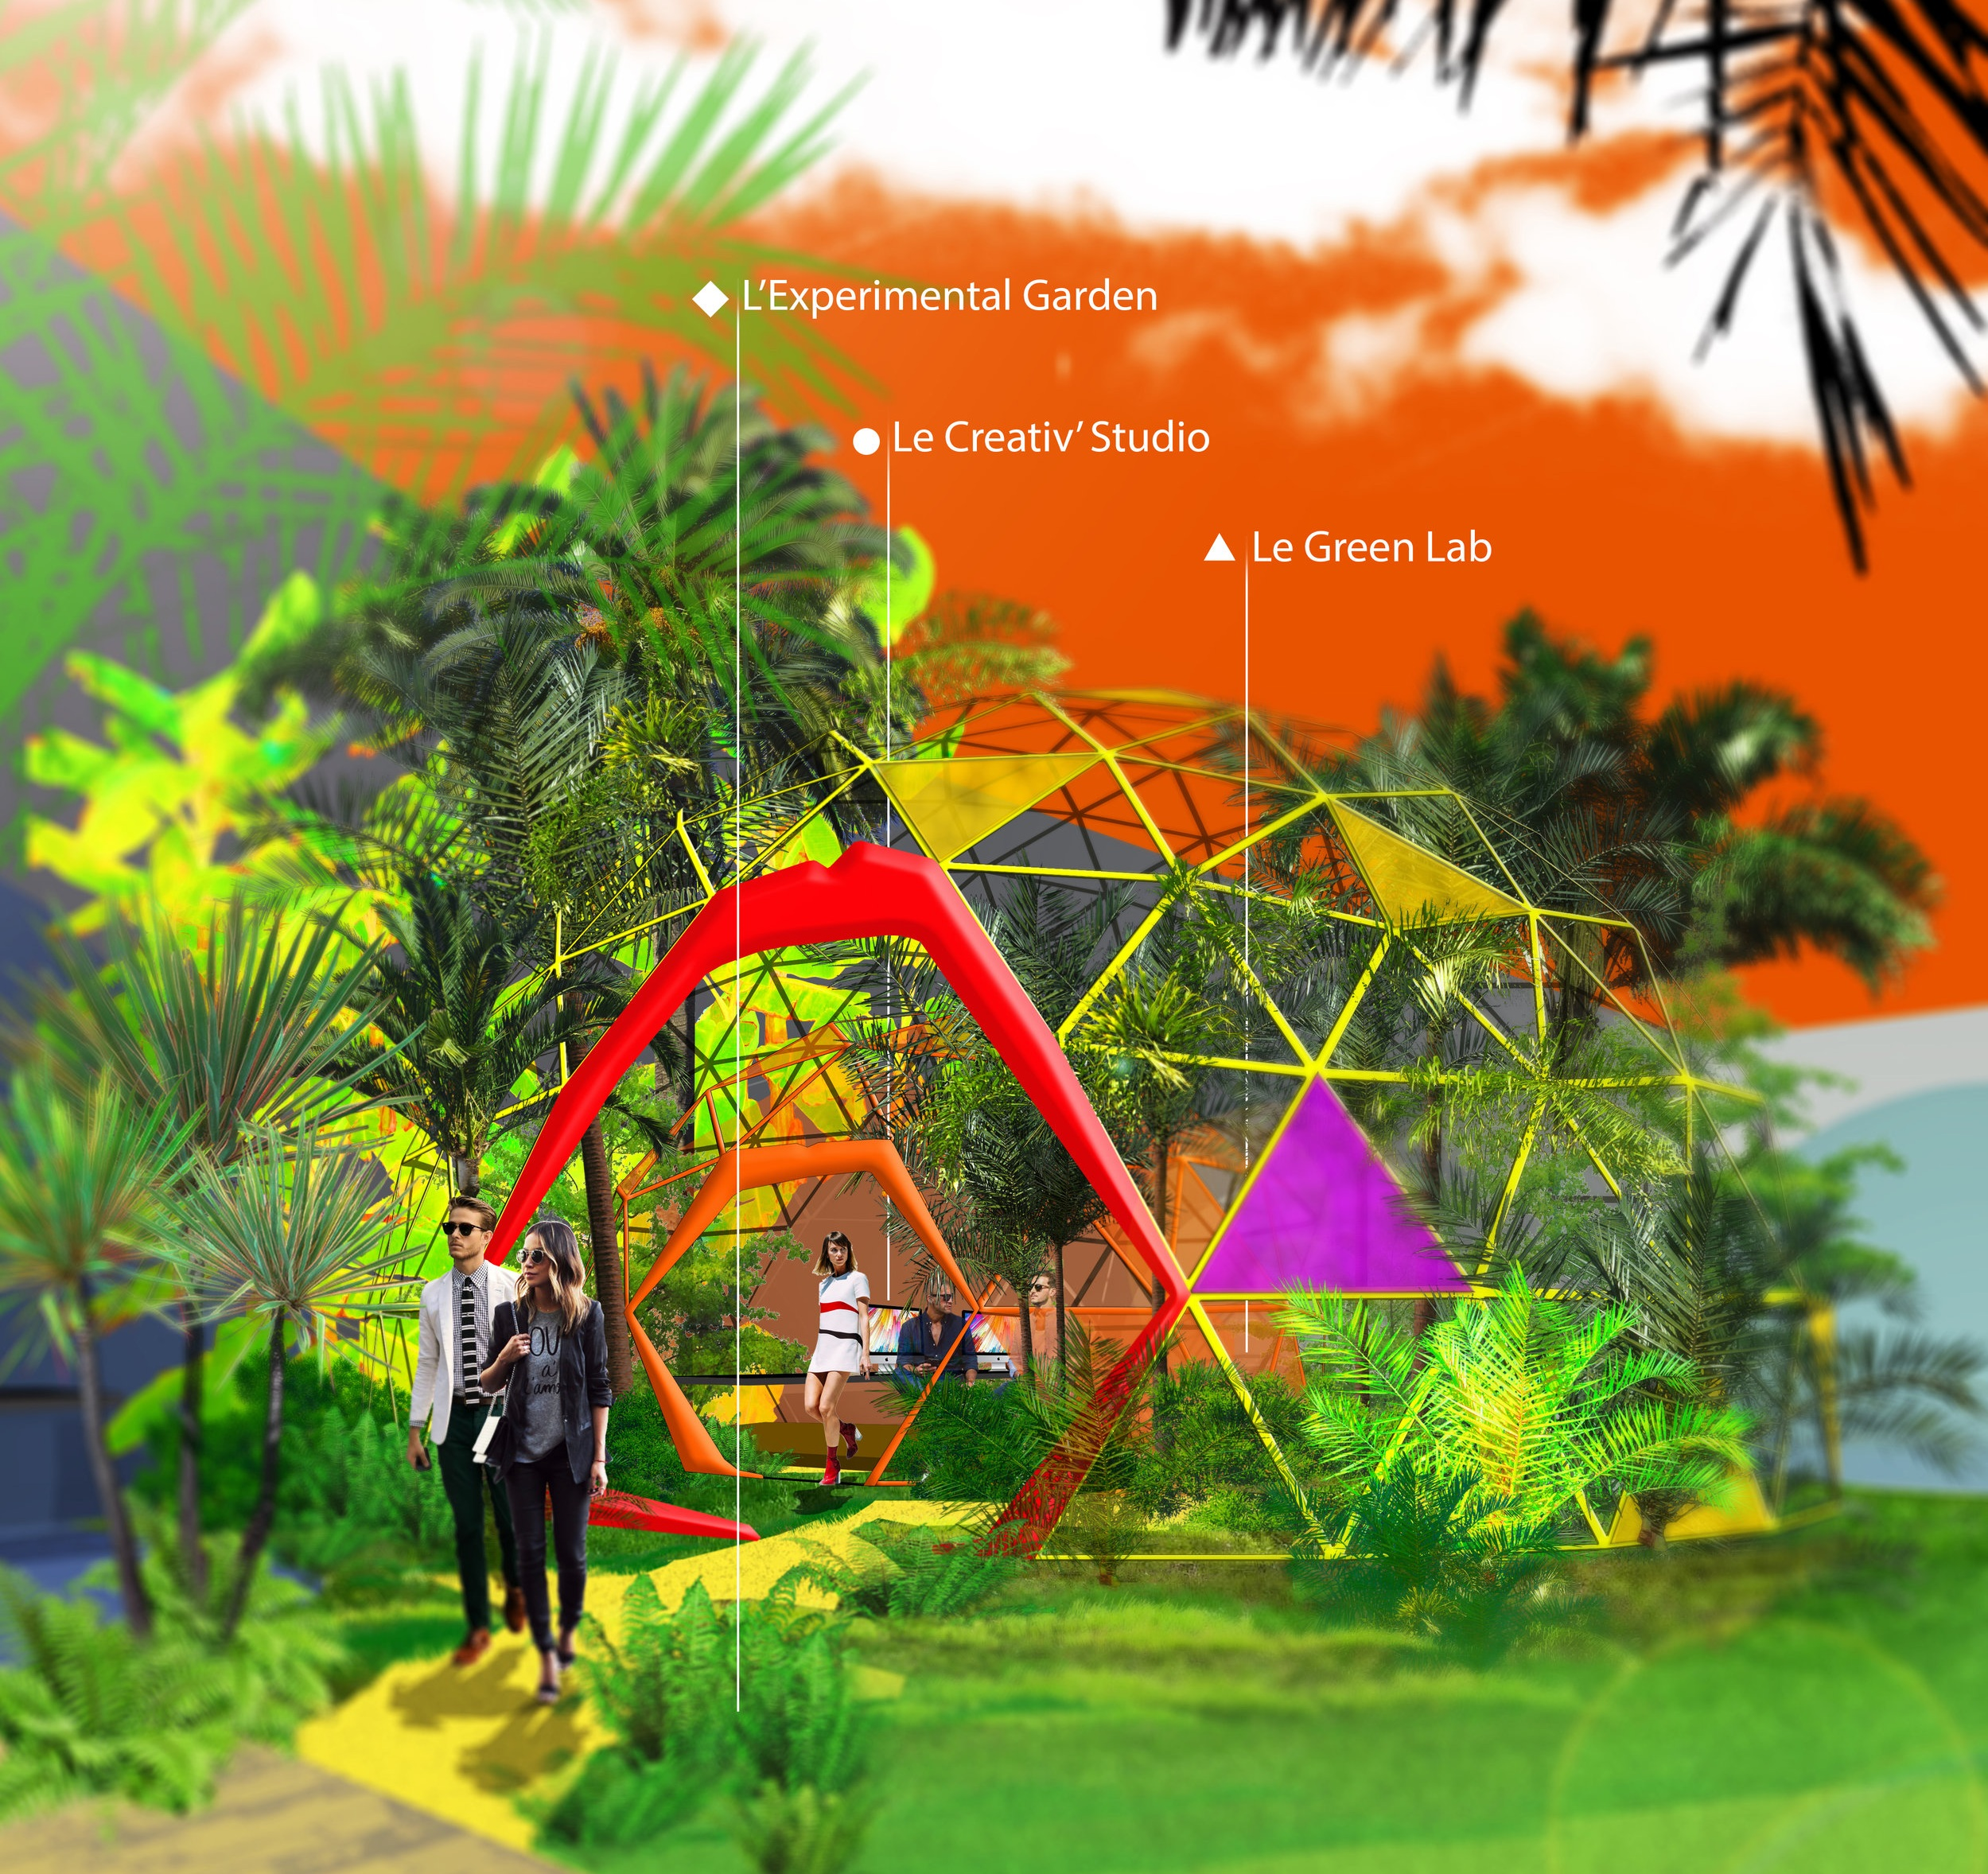 equiphotel_tradeshow_paris_terraces_gardens_outdoor_design_christophe_gautrand_landscape_4.jpg